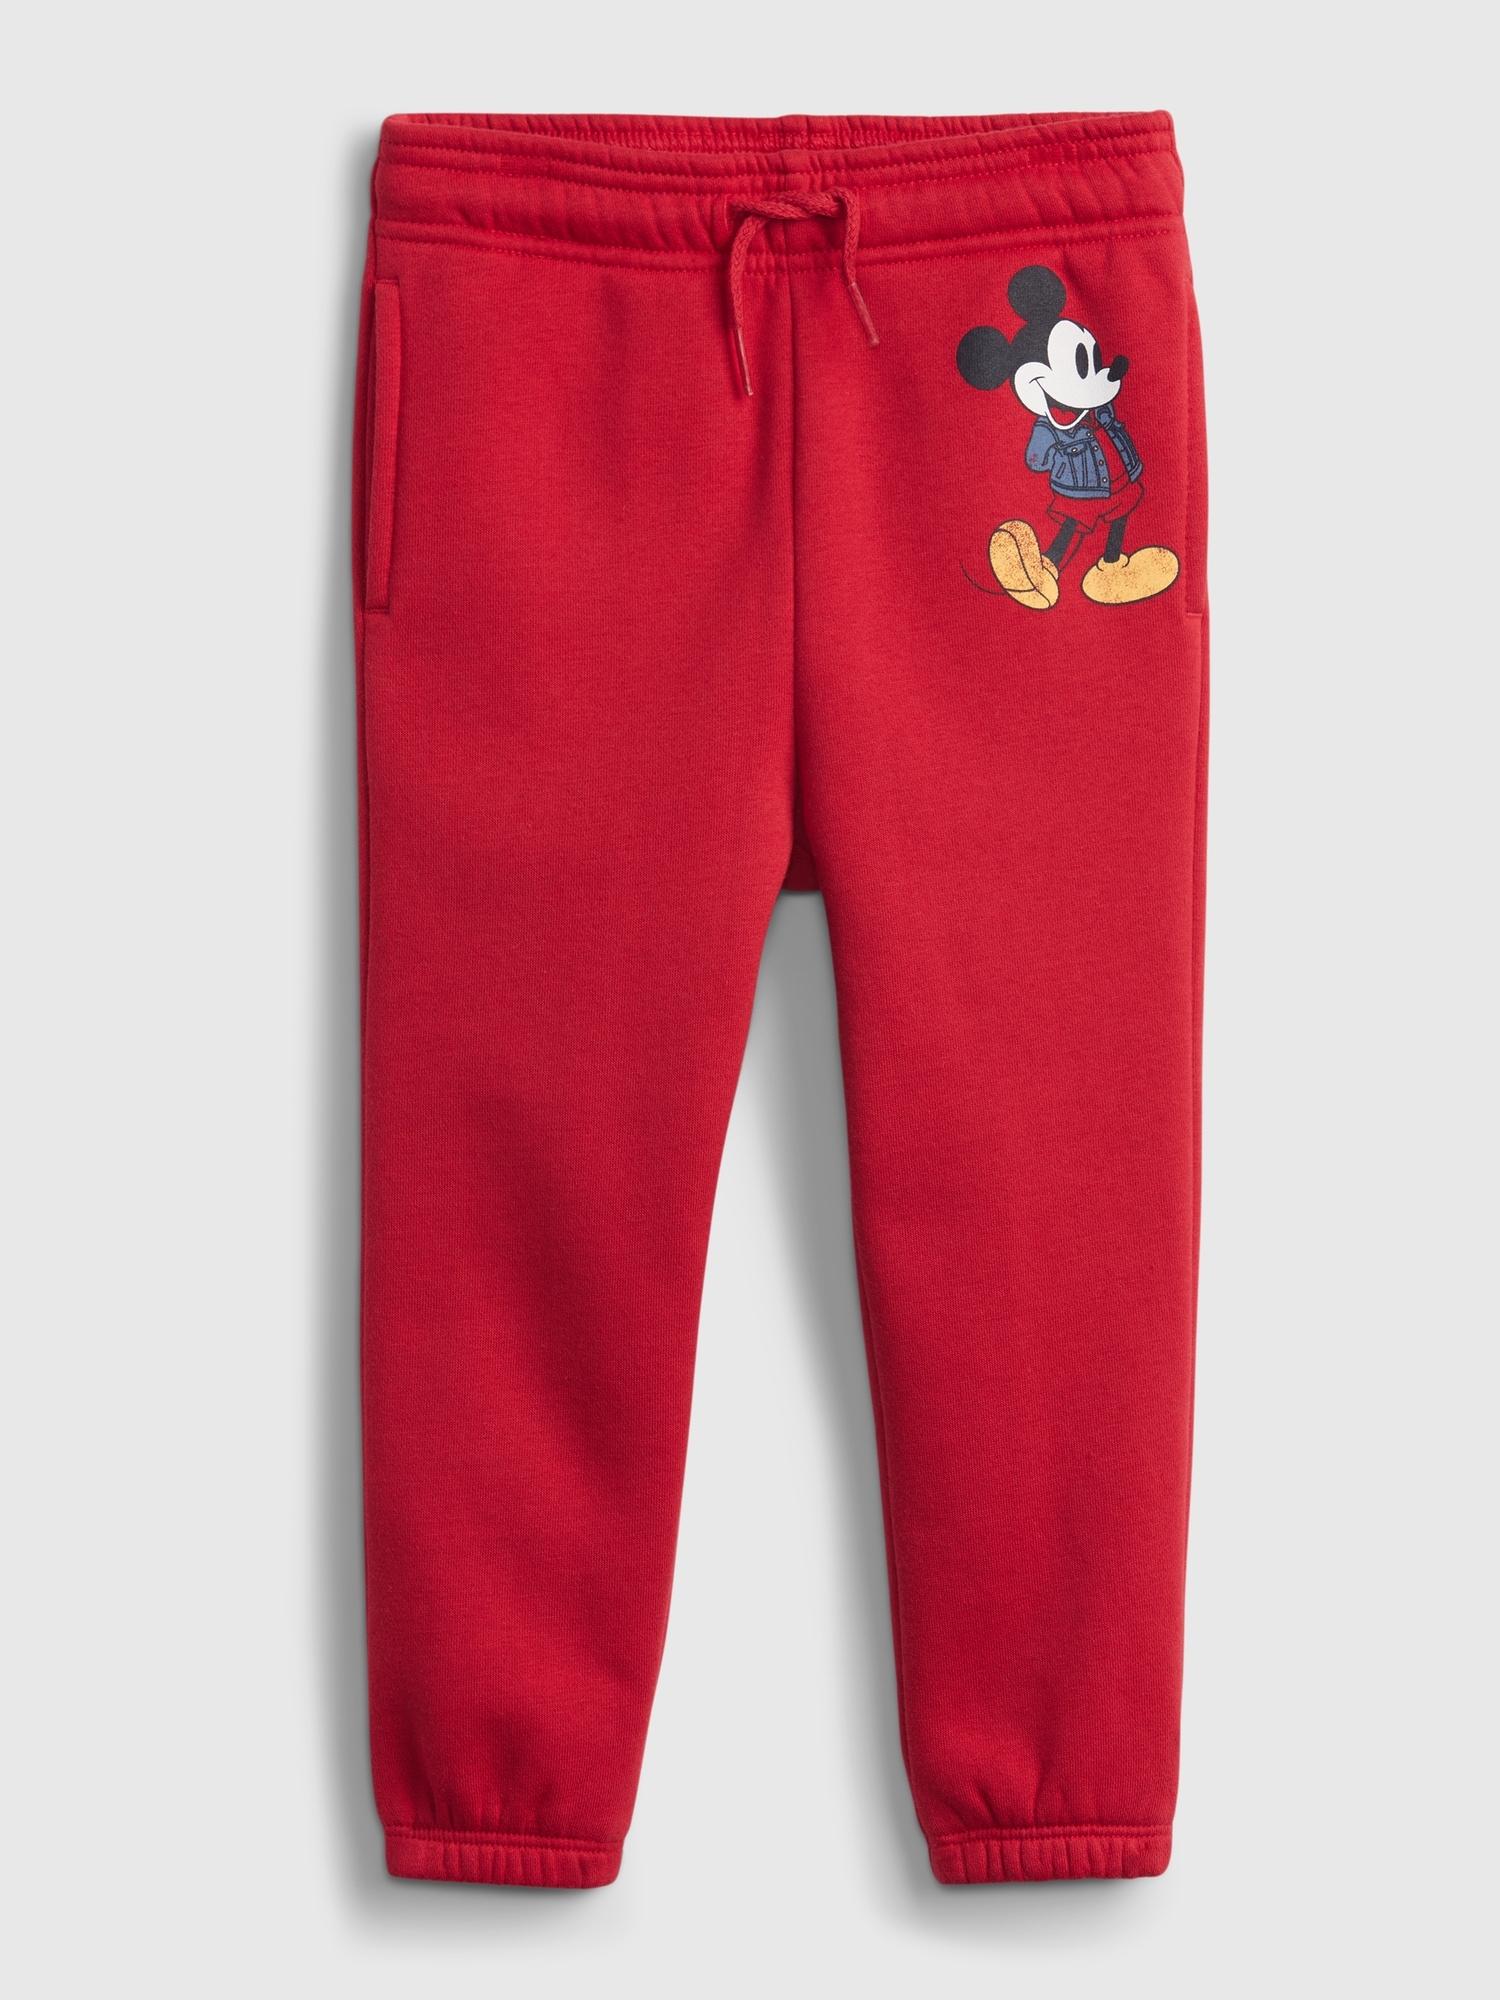 Babygap   ディズニー ミッキーマウス グラフィック ジョガーパンツ